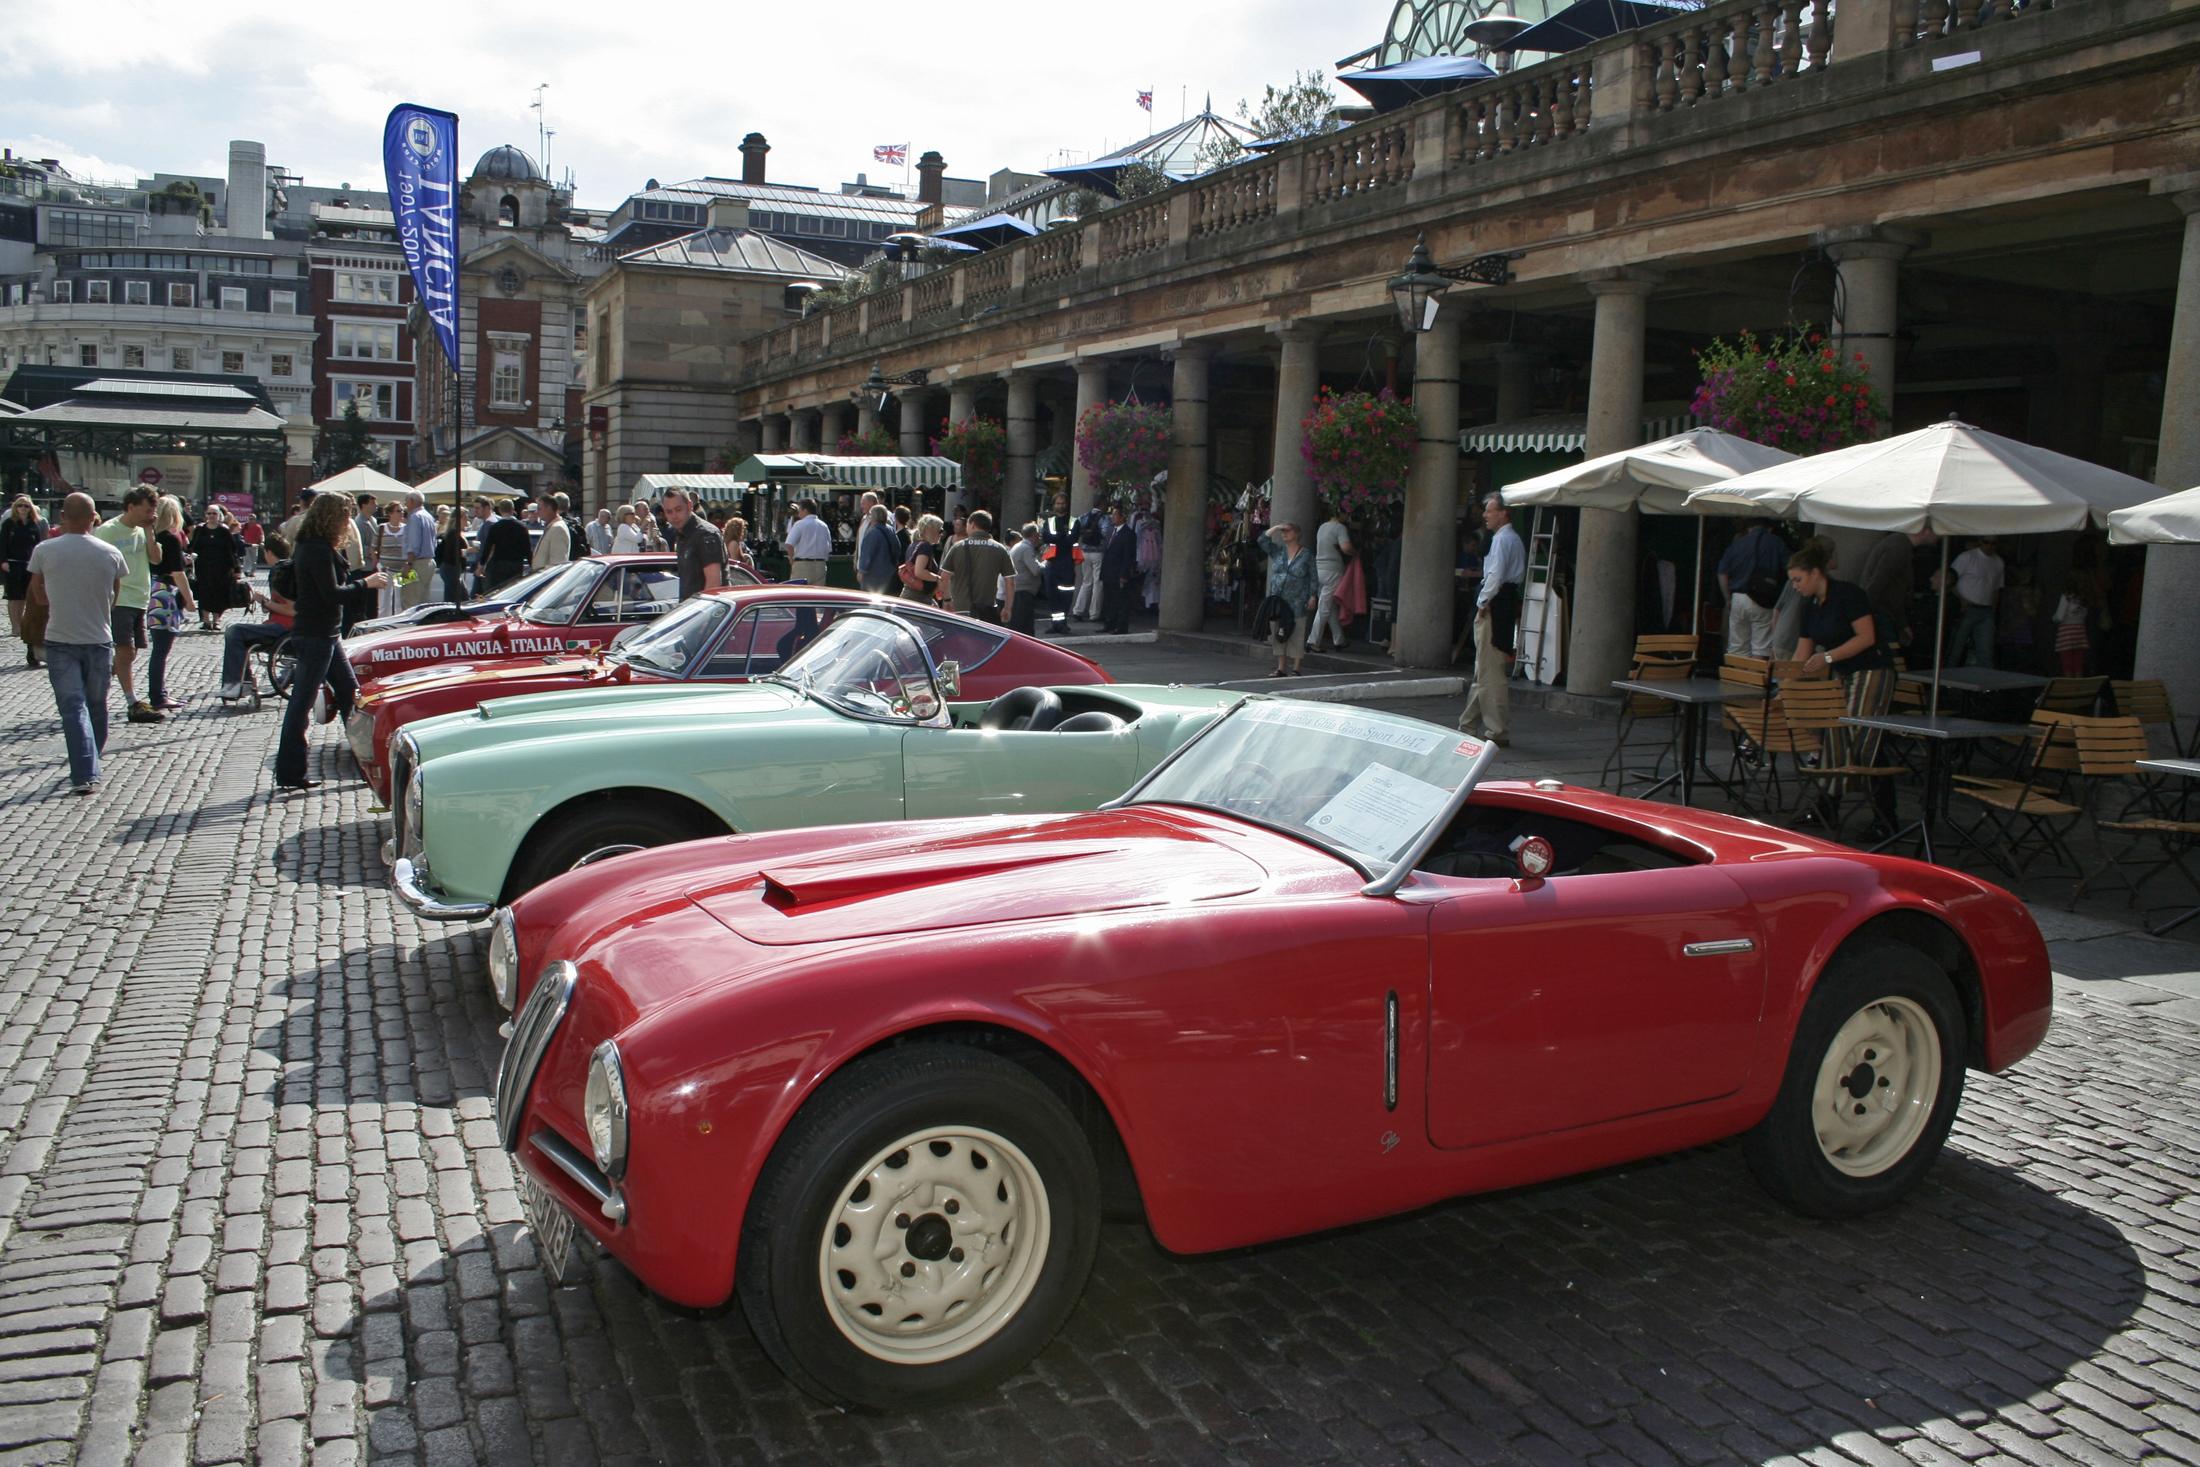 http://upload.wikimedia.org/wikipedia/commons/9/9c/Lancia_Aprilia_Ghia.jpg